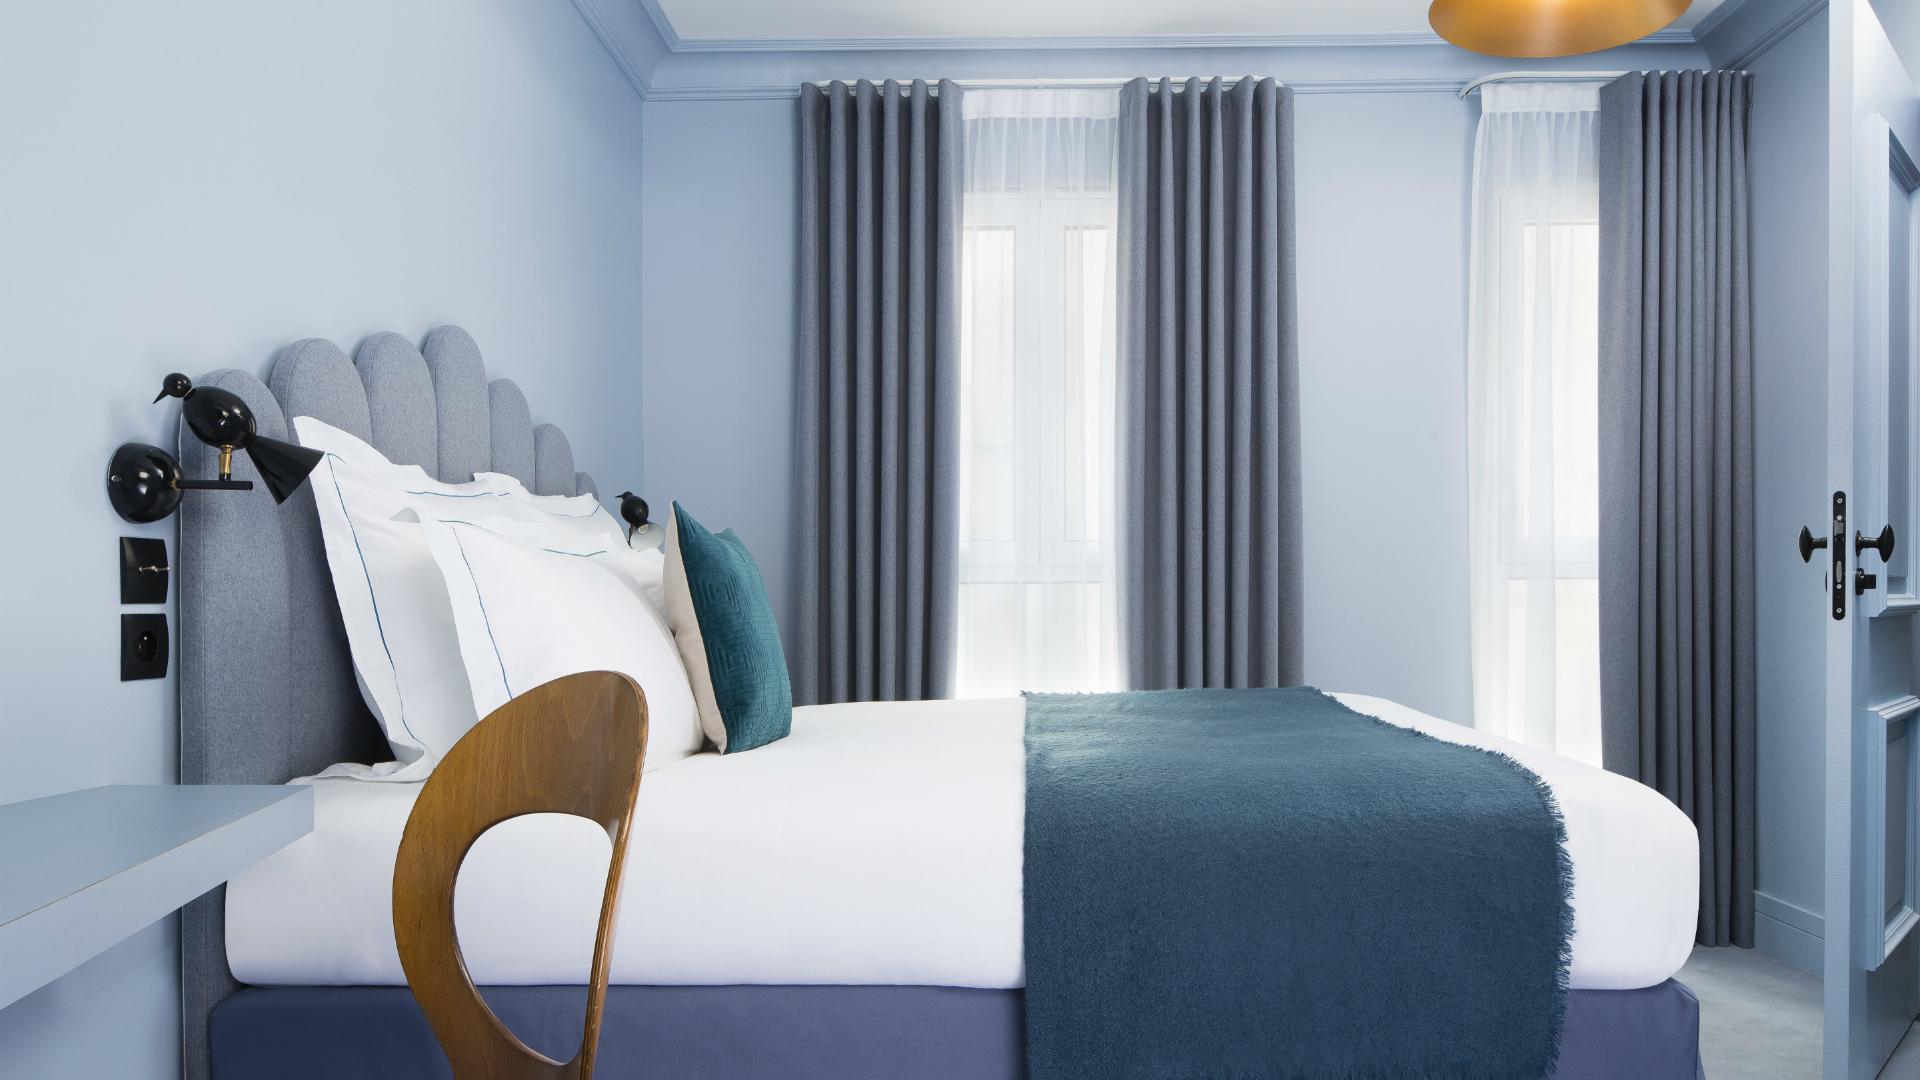 Celeste Hotel